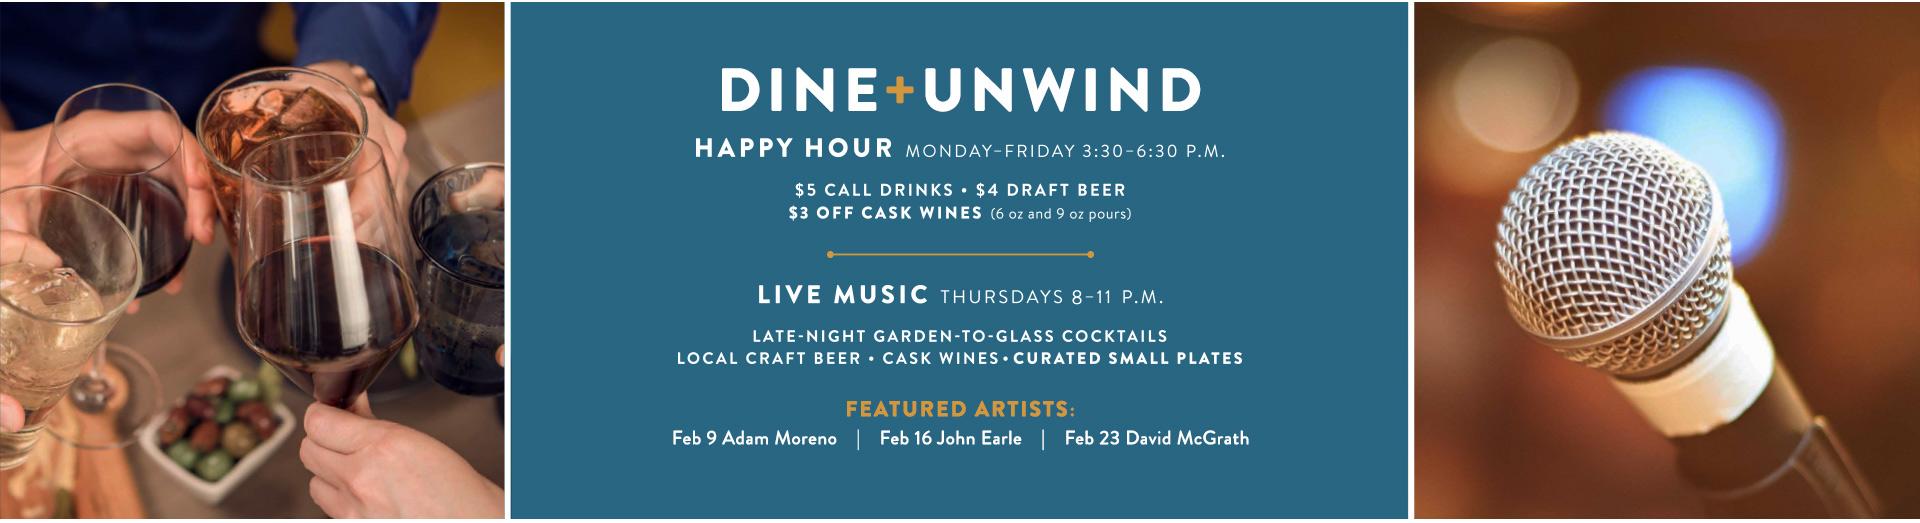 Happy Hour M-F: 3:30-6:30 PM | Late Nights: Thu 9-11:30 PM | View Menu